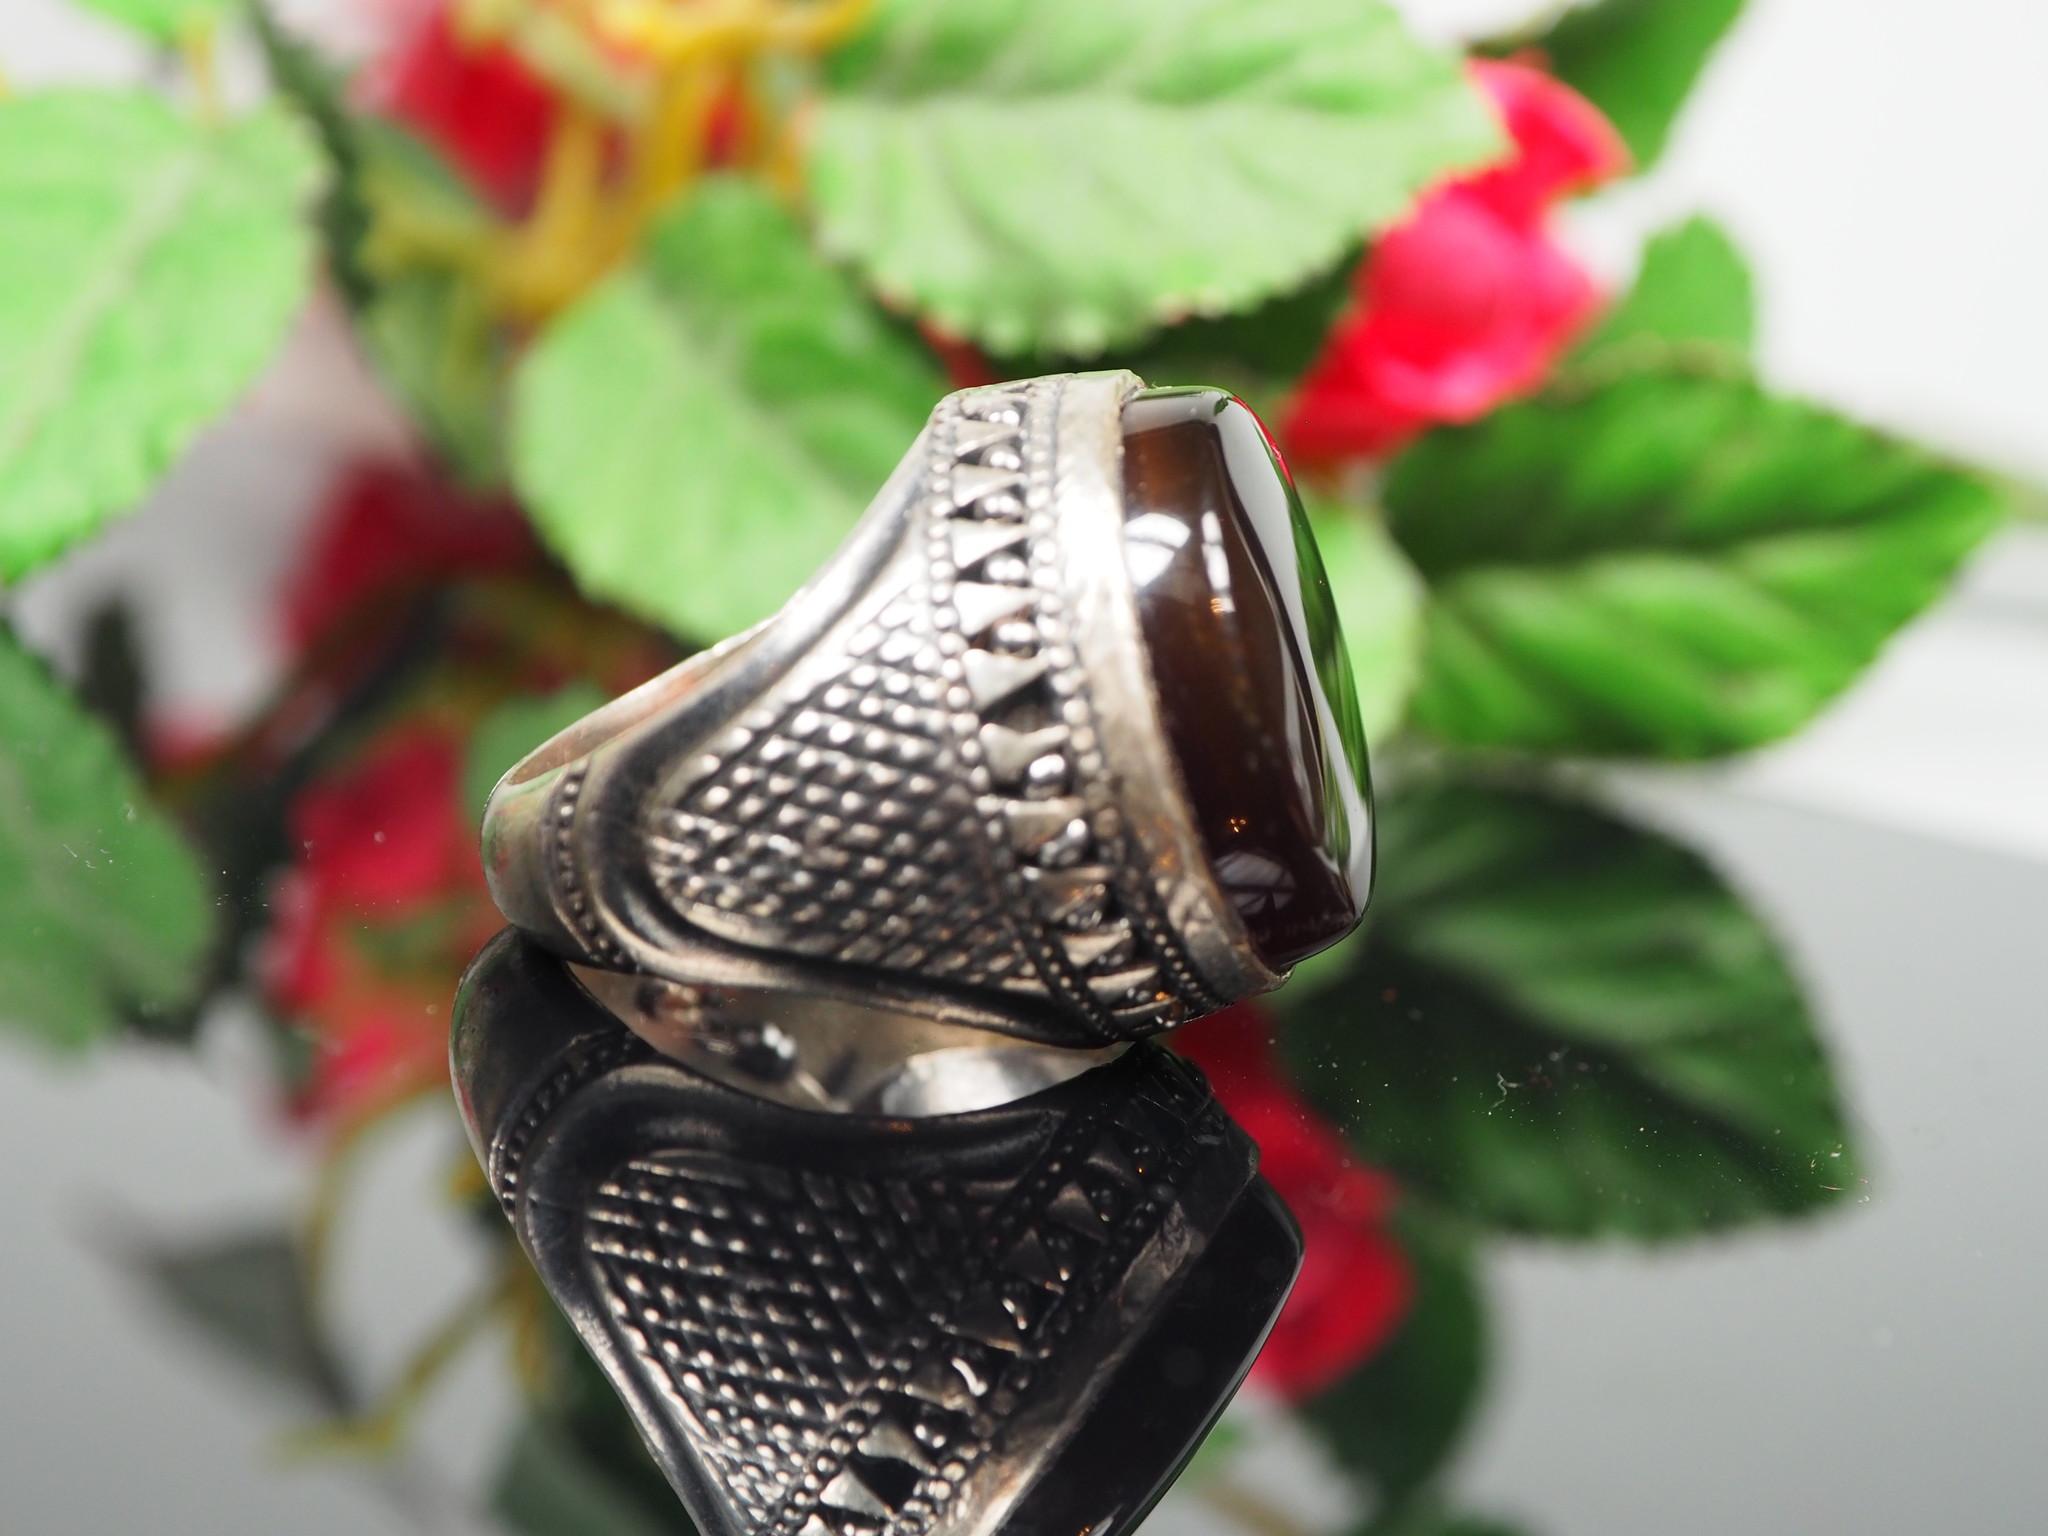 antique handmade Silver Carnelian stone turkmen statement AQEEQ ring from Afghanistan No:WL21/12